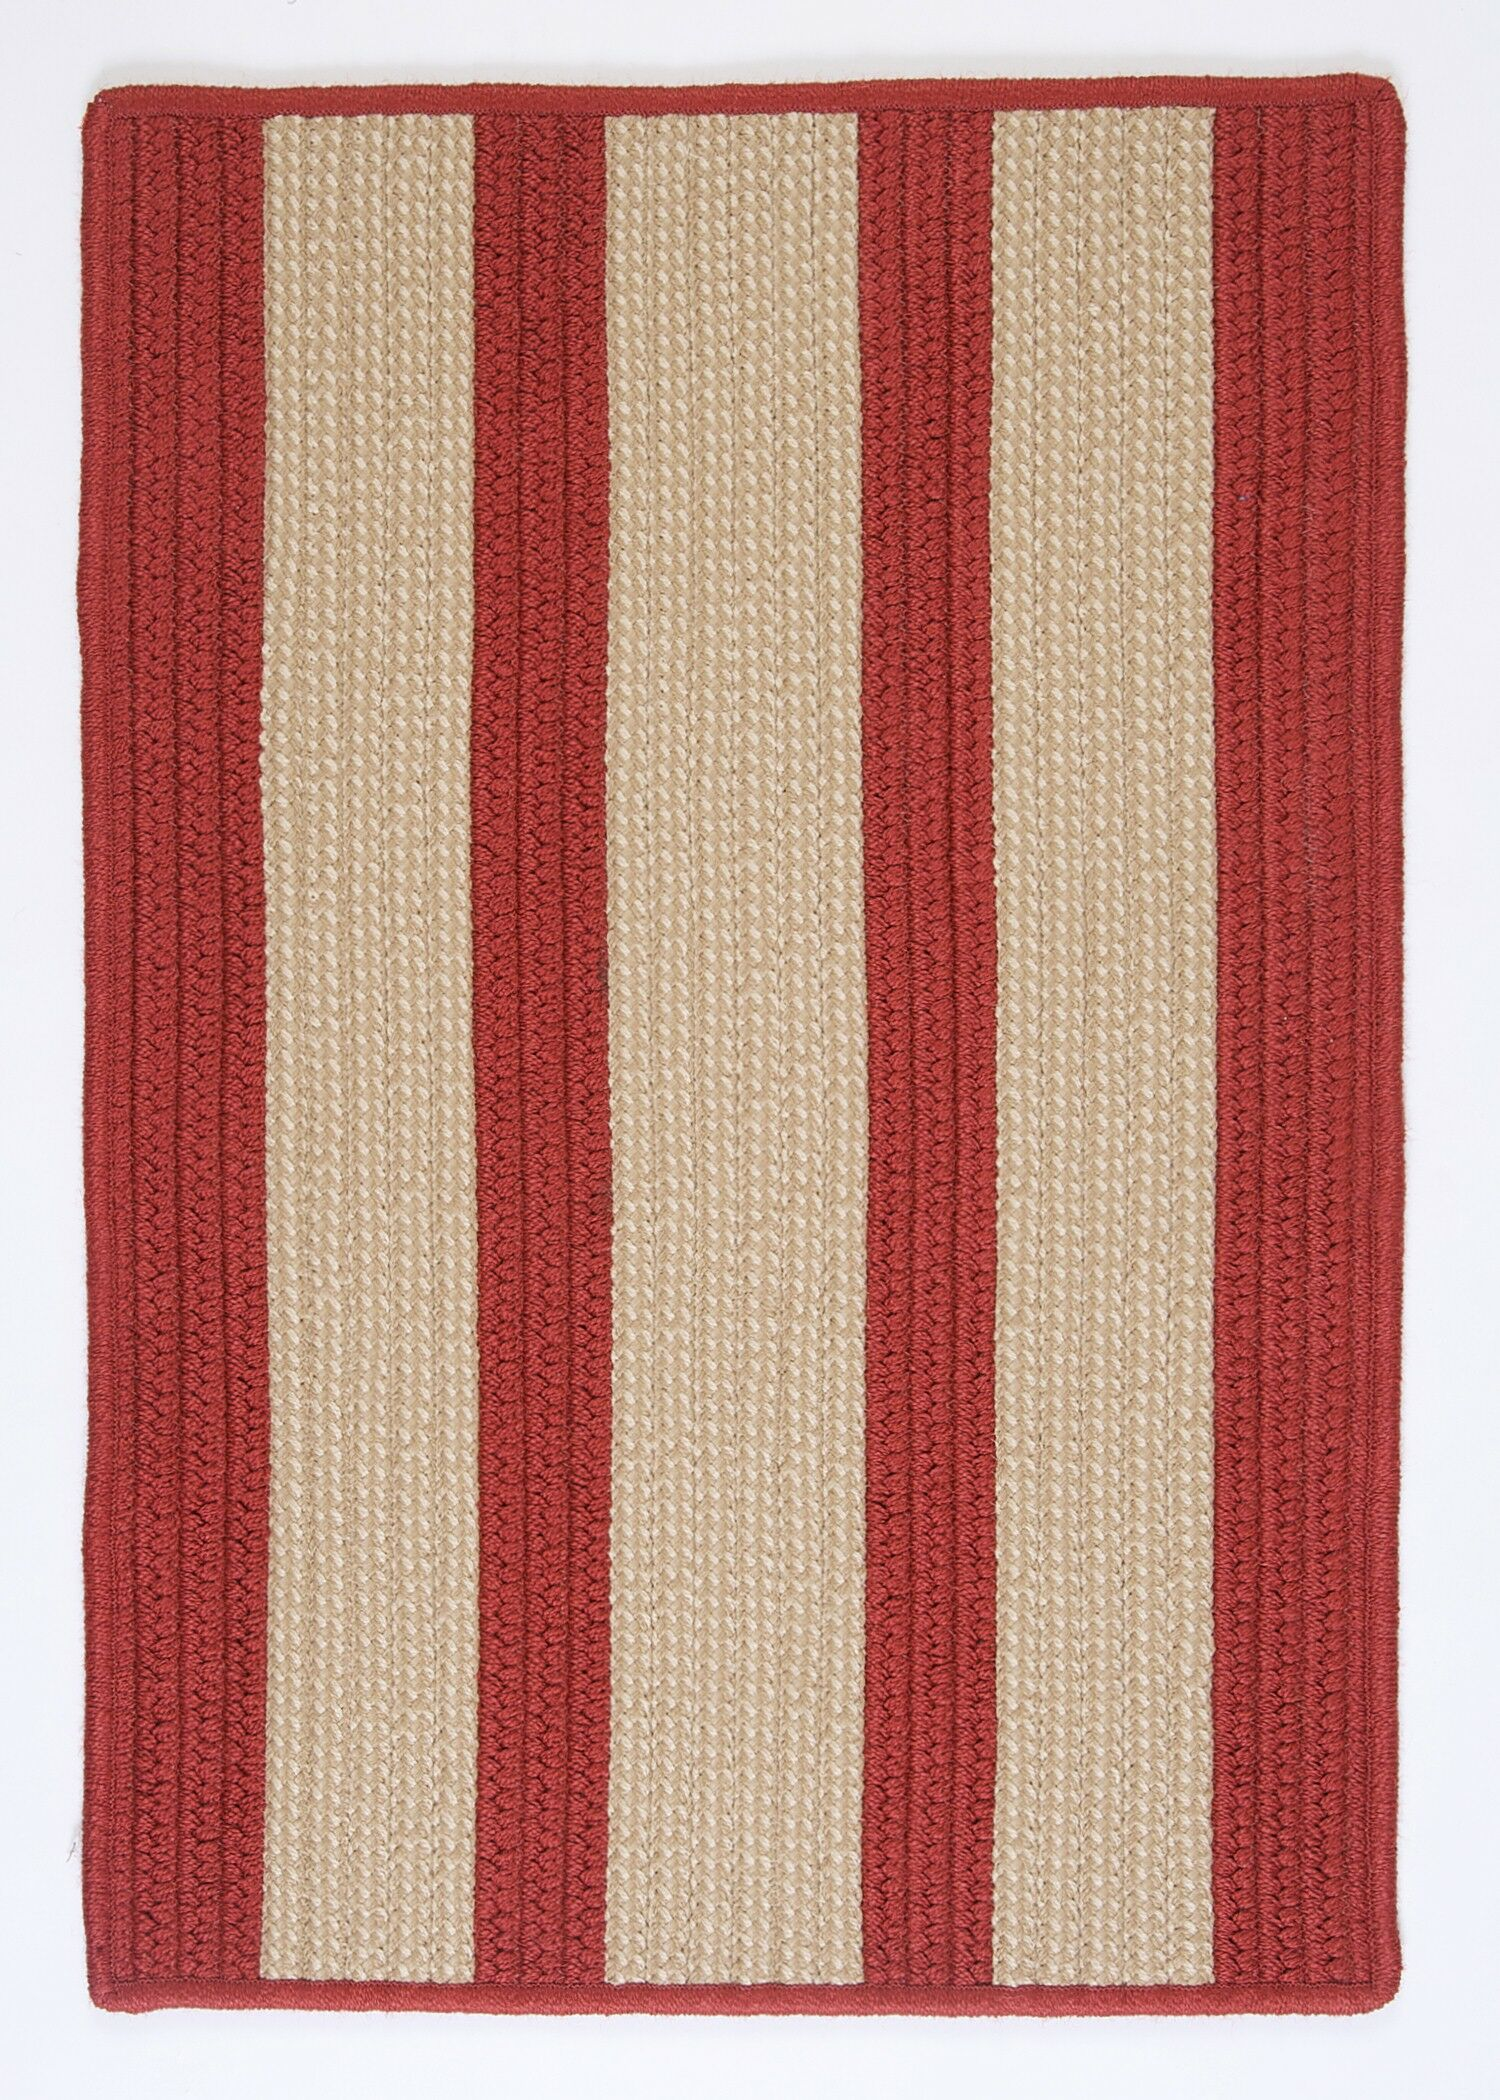 Seal Harbor Rust Red Indoor/Outdoor Area Rug Rug Size: Rectangle 12' x 15'